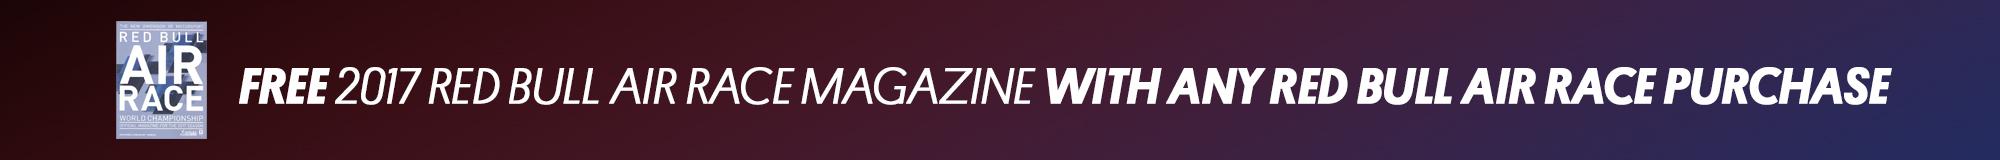 homepage-ims-small-redbull-freemagazine-color.jpg